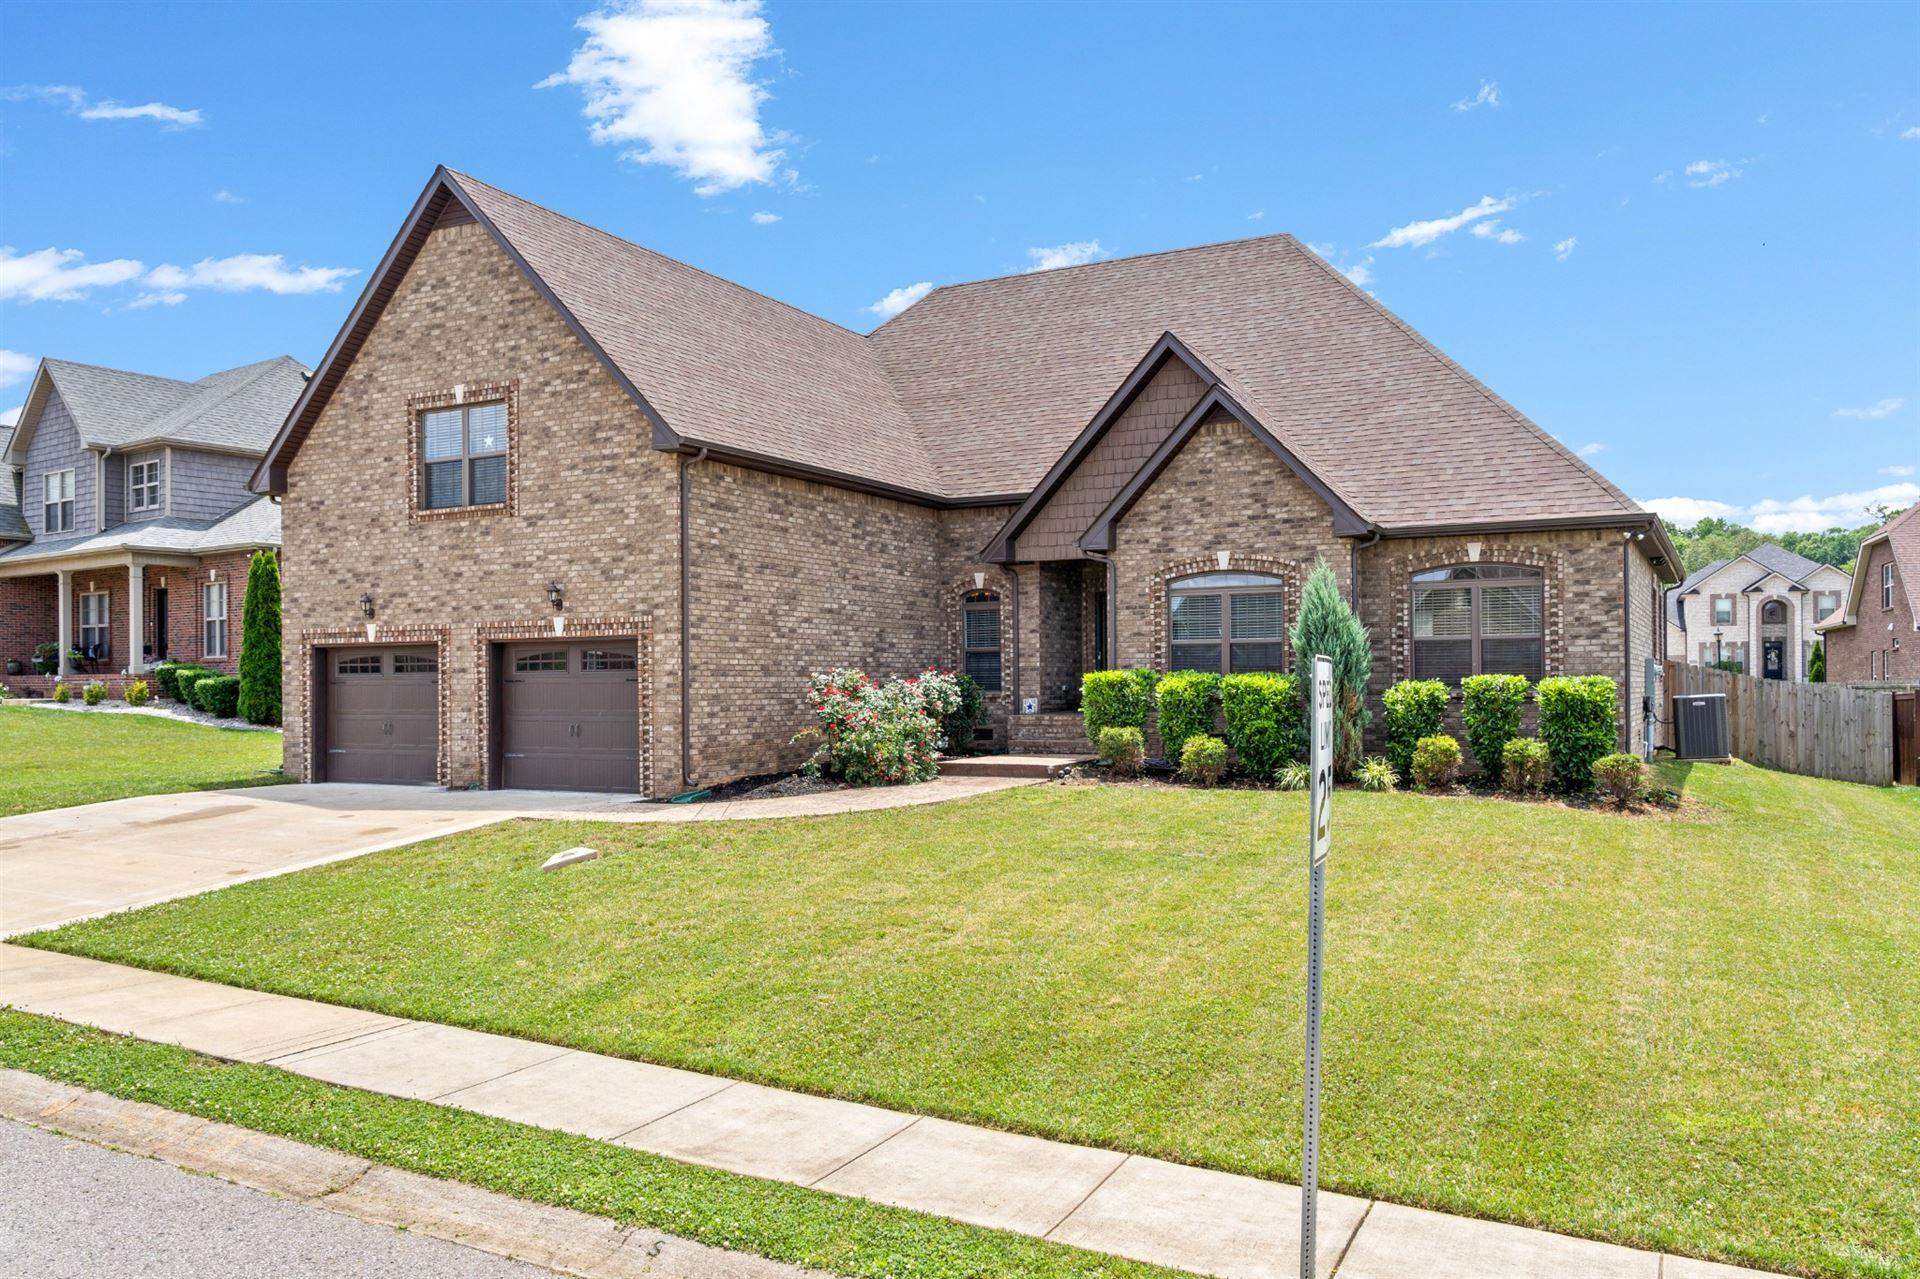 140 Summer Terrace Ln, Clarksville, TN 37040 - MLS#: 2160102